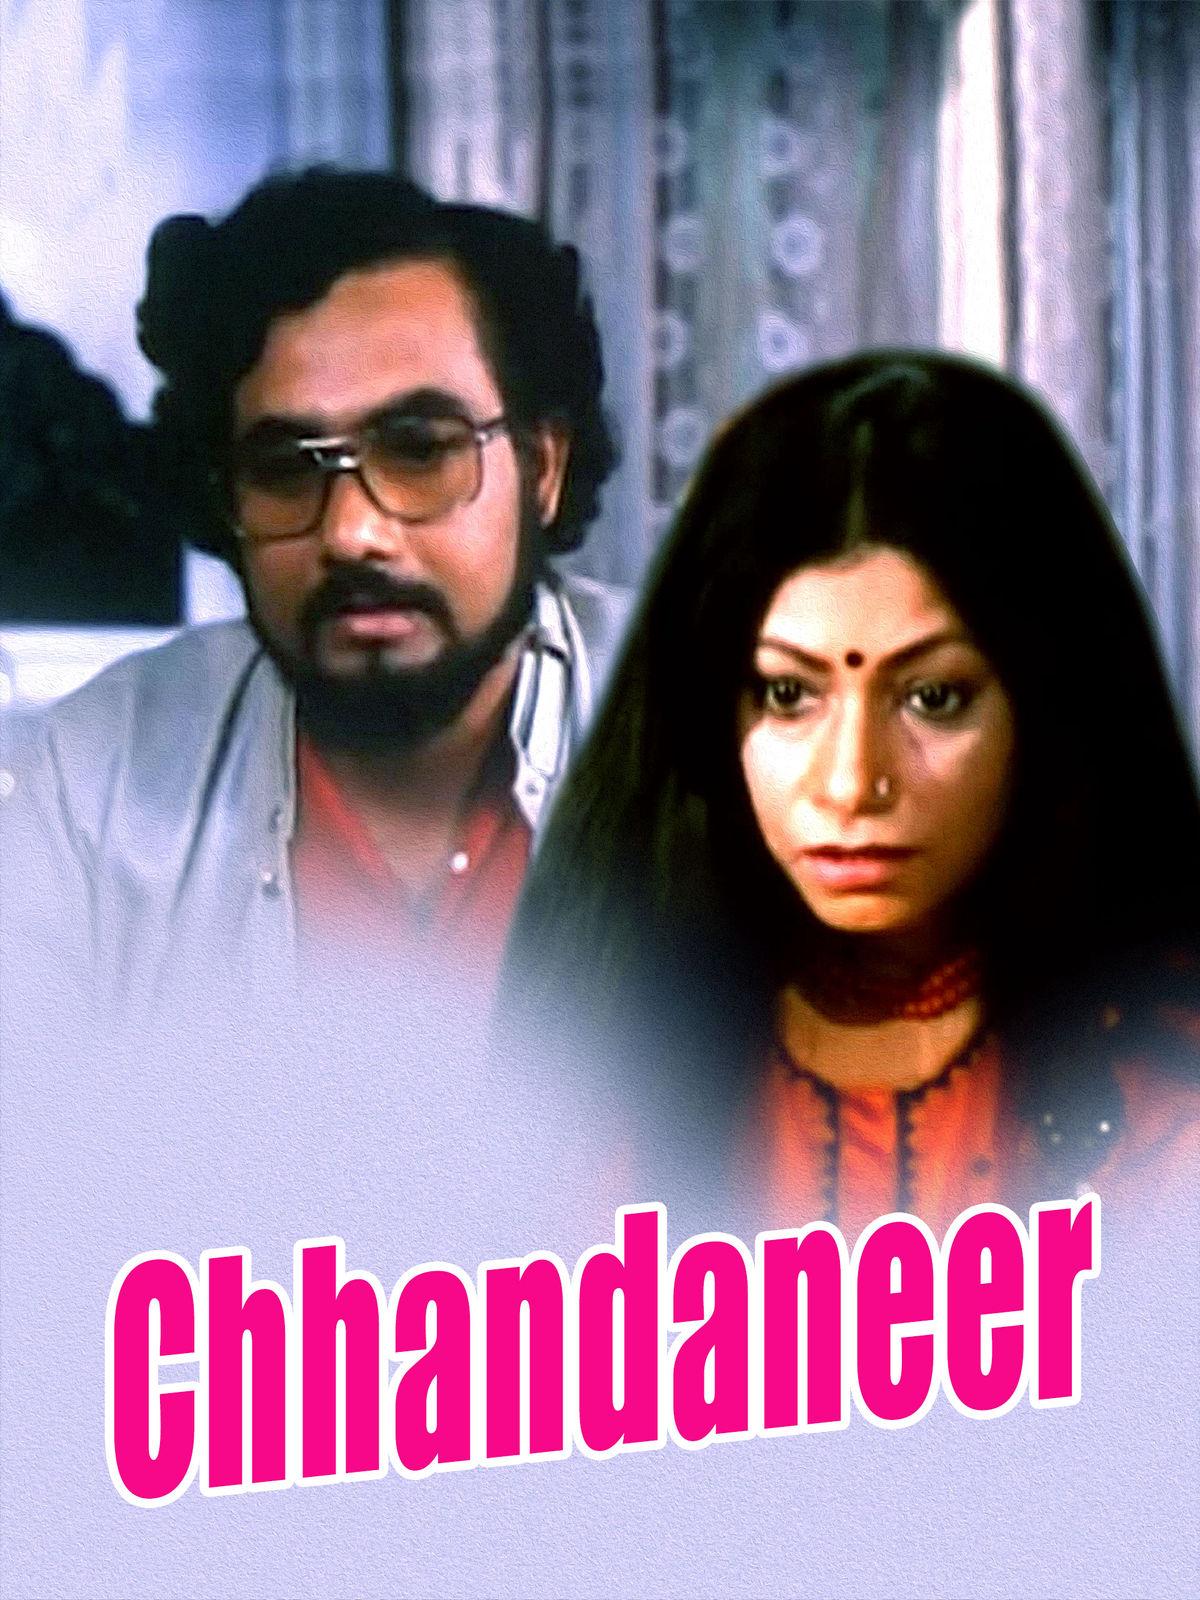 Arjun Bhattacharya Best Movies, TV Shows and Web Series List